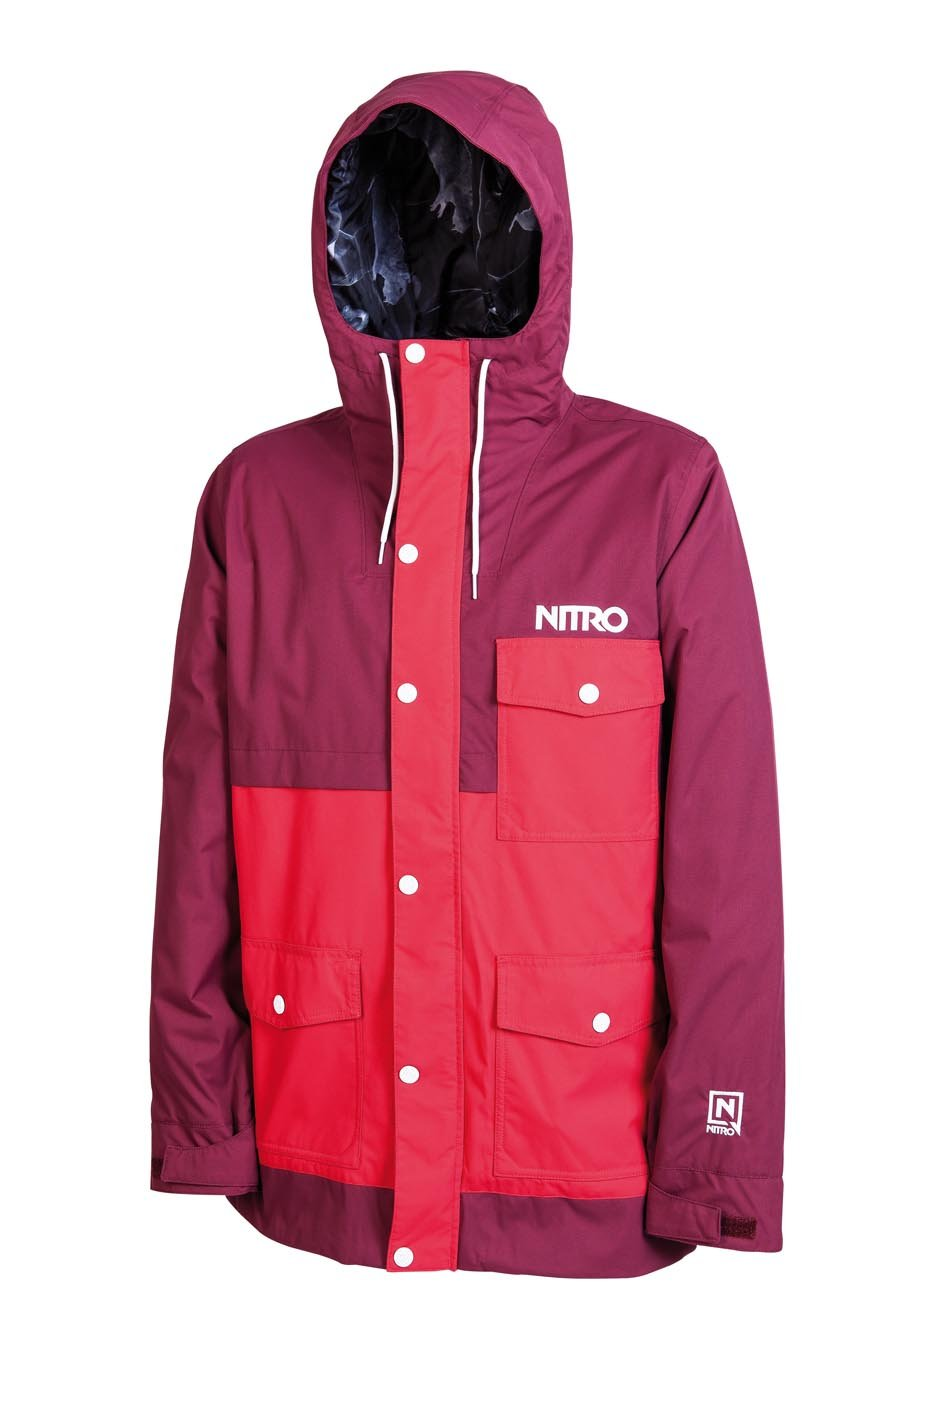 Nitro Snowboards Herren Snowboardjacke Rocket Jacket 14 günstig